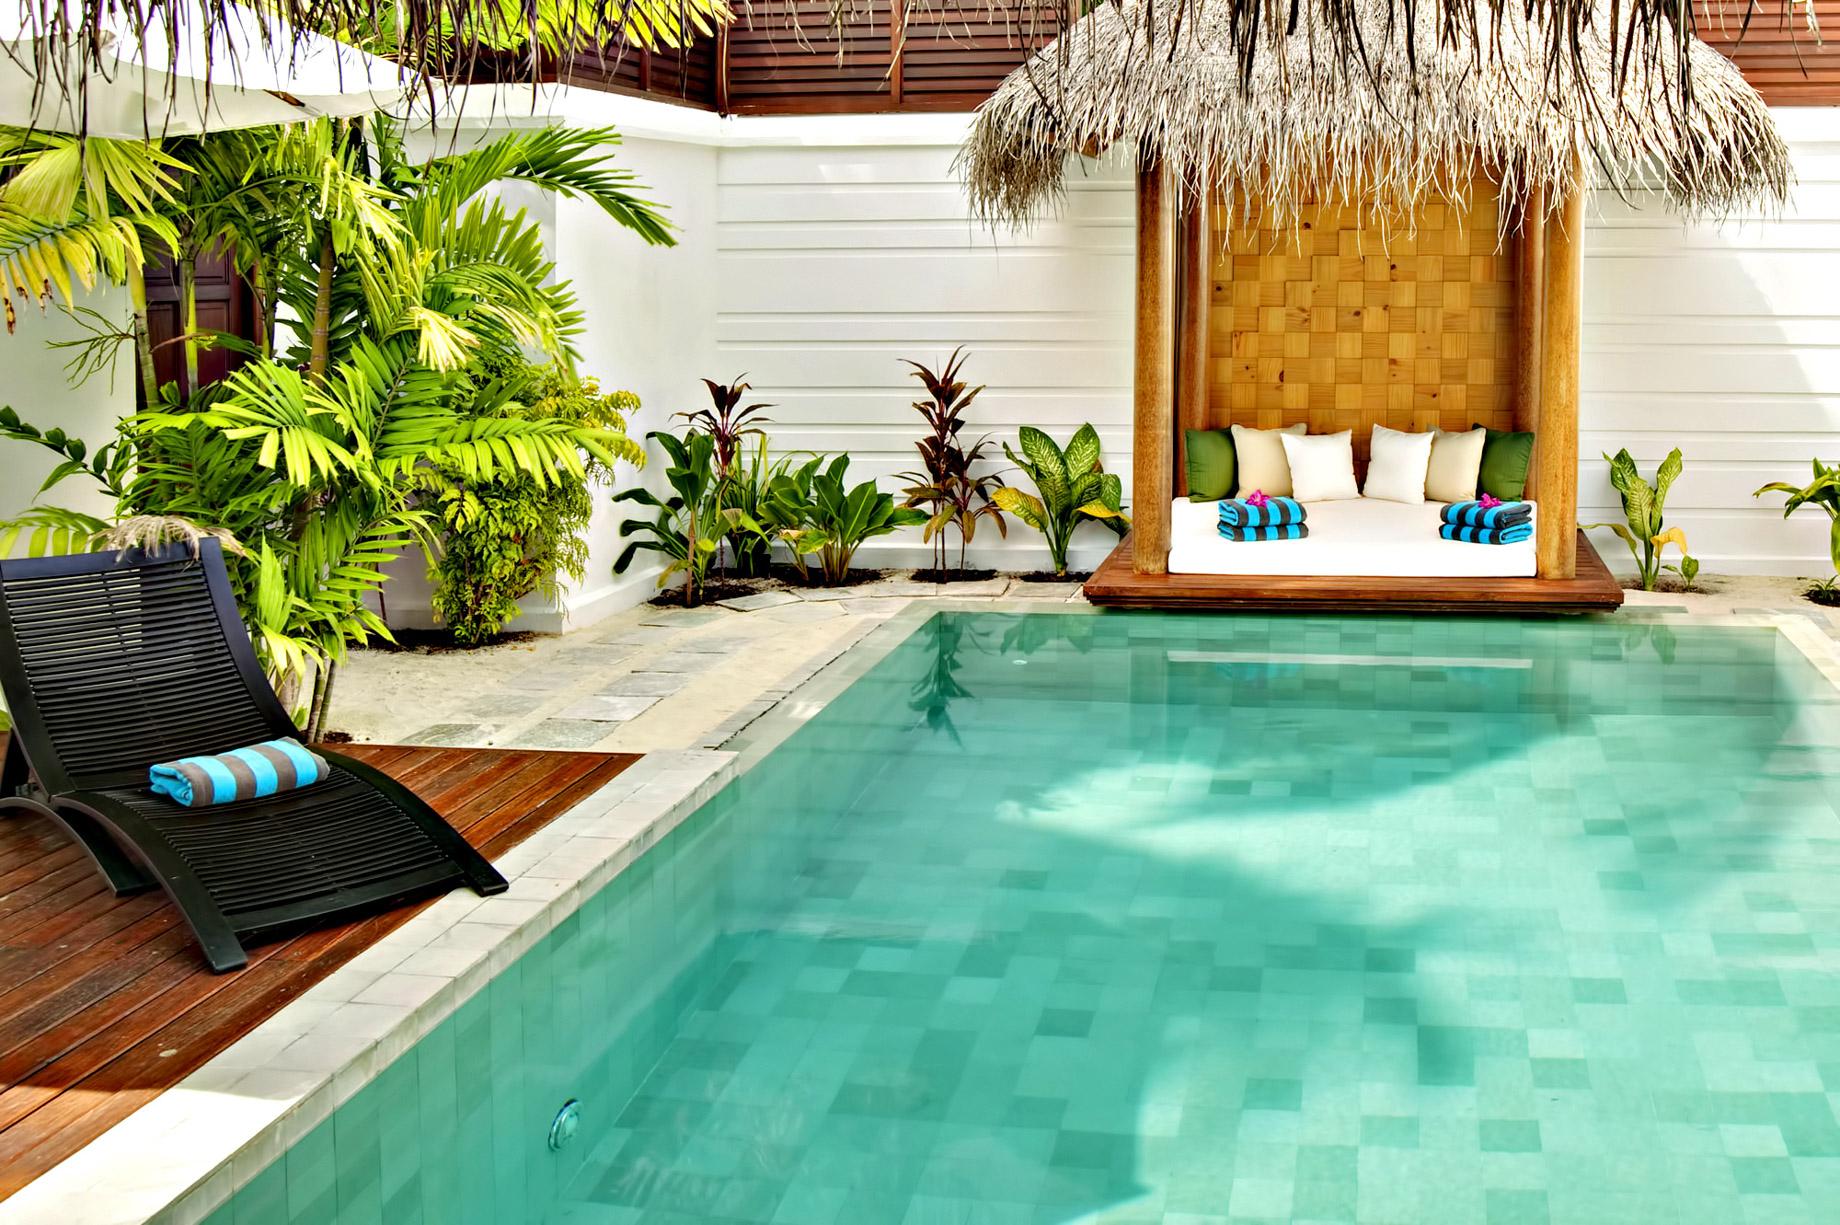 Velassaru Maldives Luxury Resort - South Male Atoll, Maldives - Tropical Villa Pool